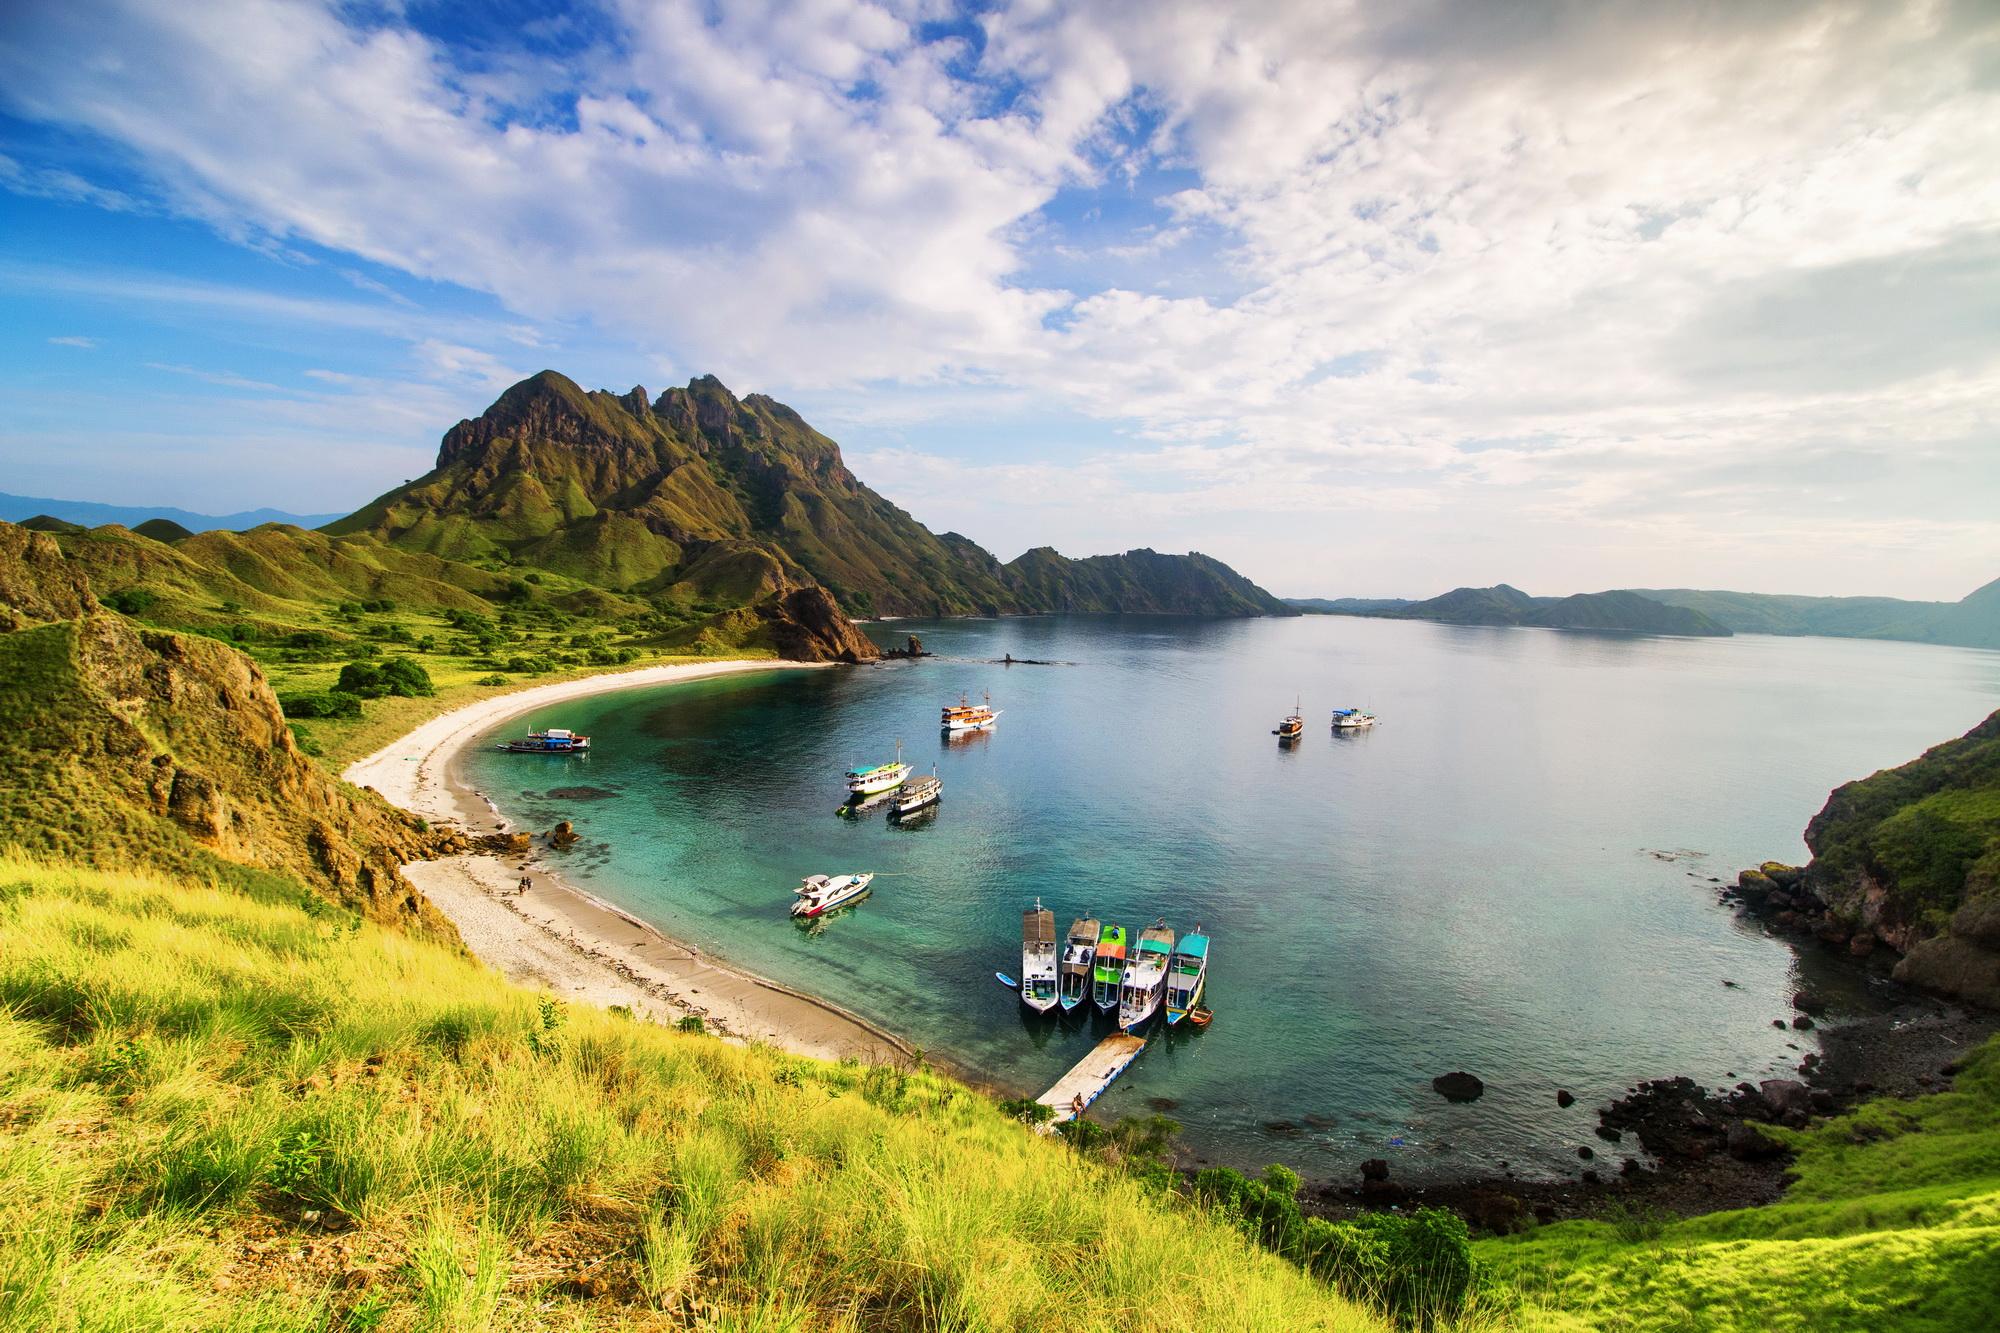 NTT, Nusa Tenggara Timur, Pulau Padar, Komodo, Komodo Dragon, TN Komodo,